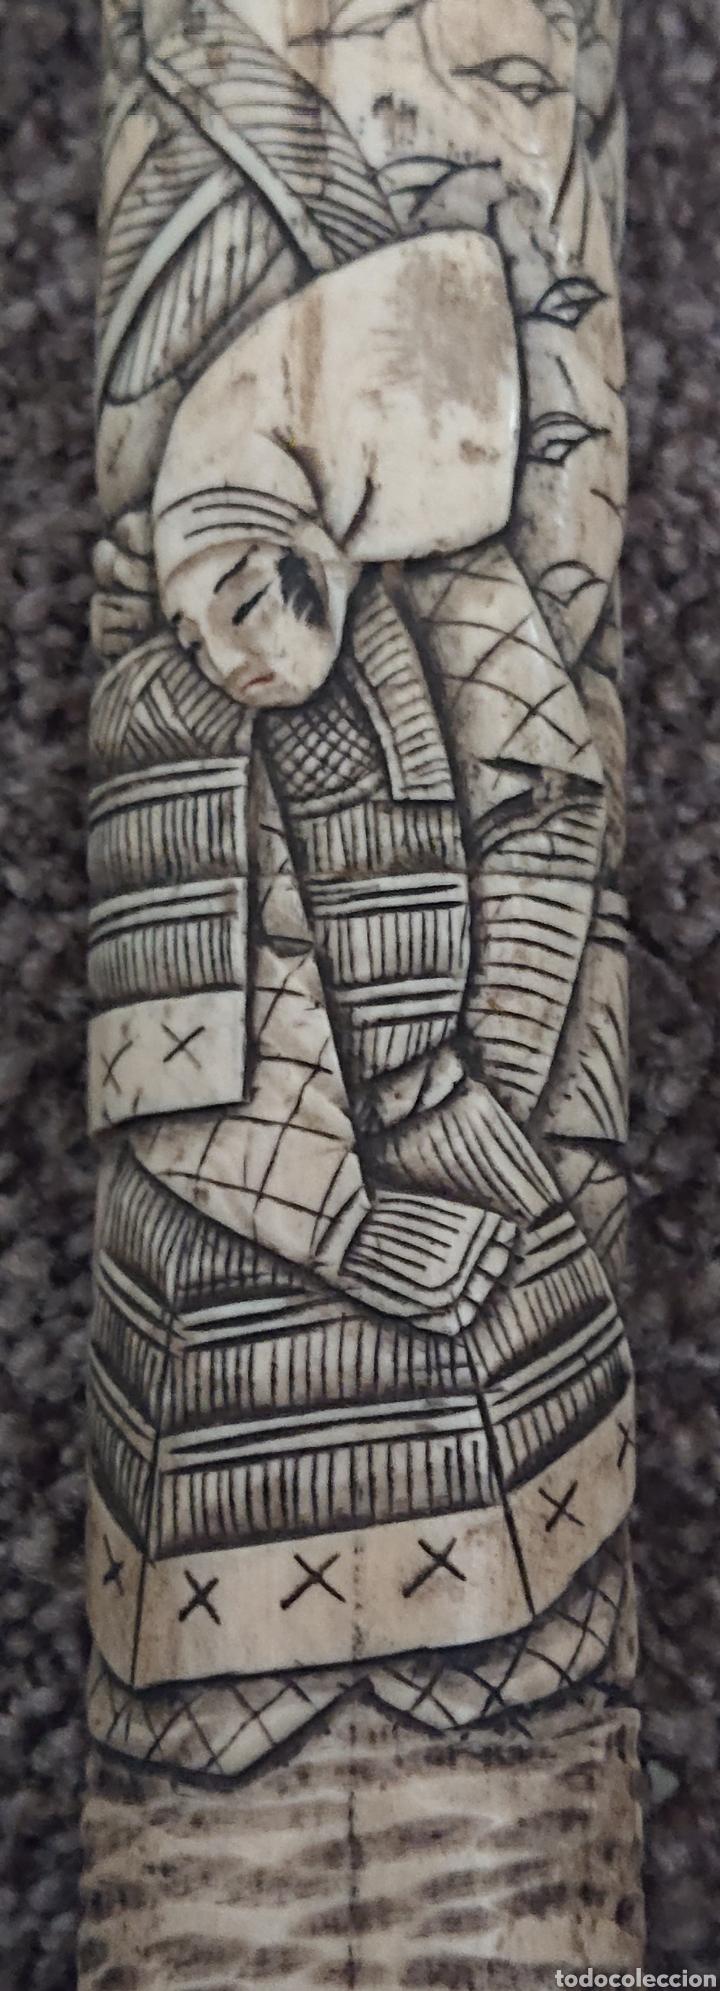 Arte: Funda sable o espada japonés, Japón, hueso o similar, gran pieza, ved fotos - Foto 5 - 276801593